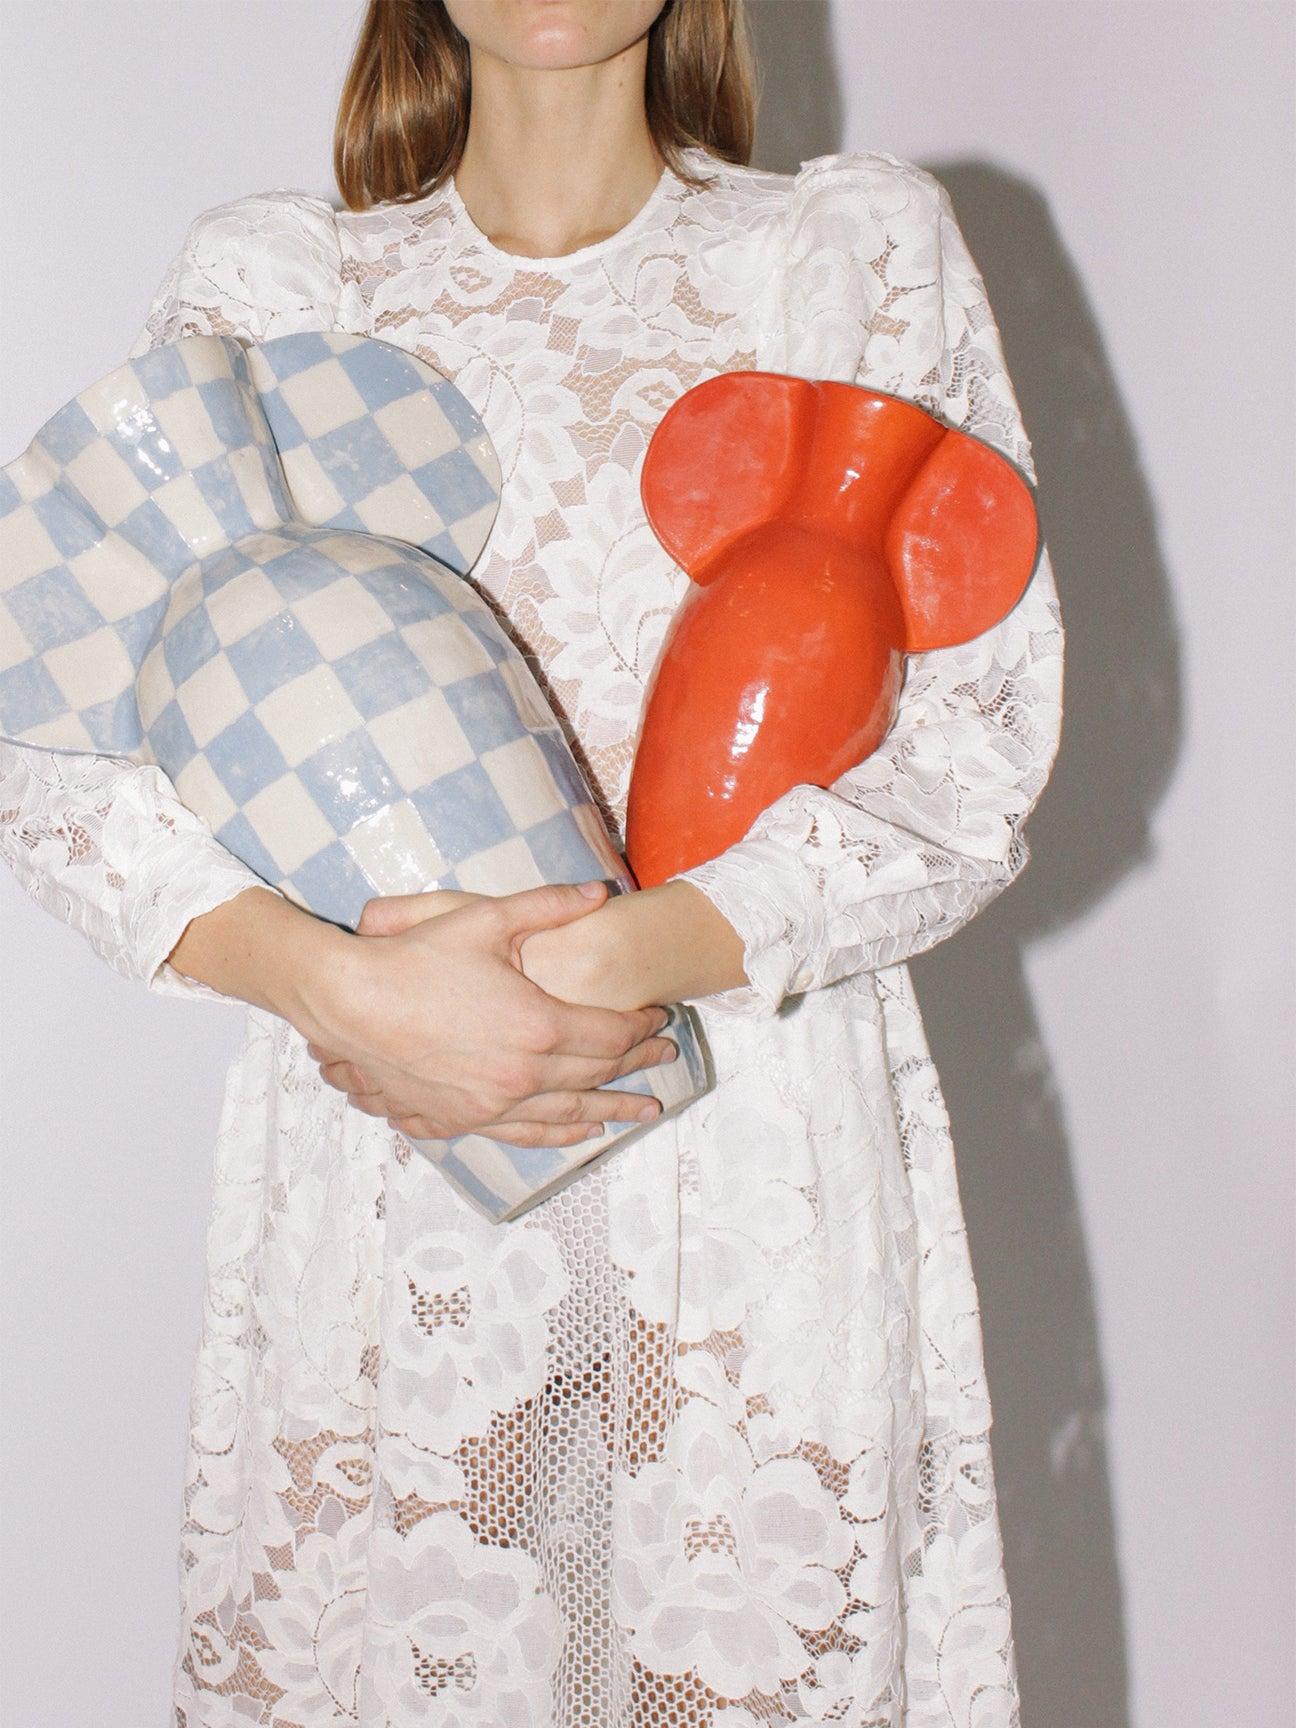 This Cult-Favorite Scandi Brand Is Making Wish List–Worthy Ceramics Now